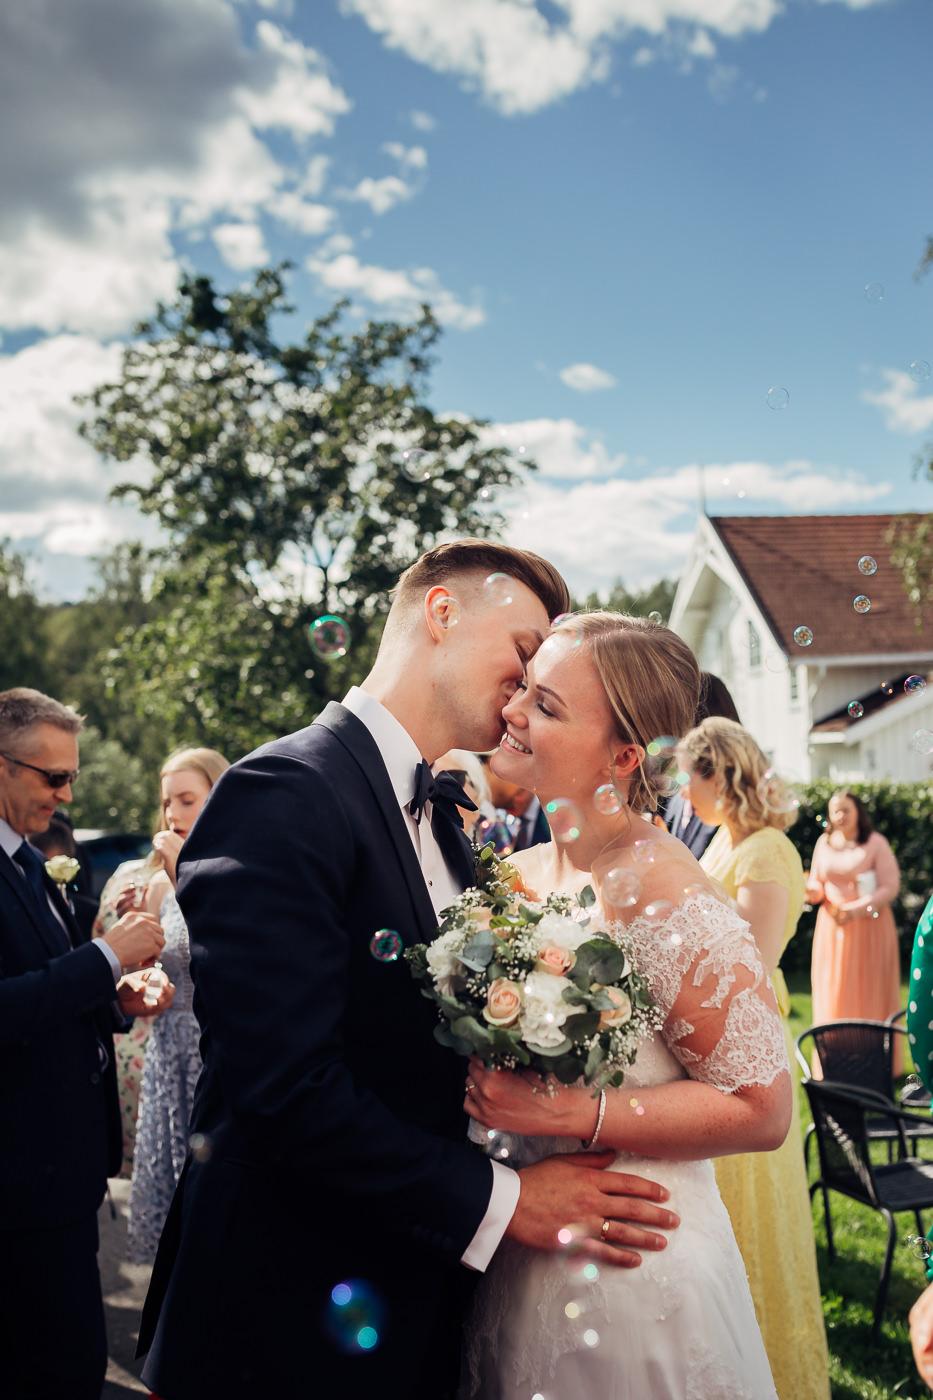 Ida Nathalie & Sebastian  - vakkert junibryllup i Lillestrøm Bryllupsfotograf Hellerud Akershus 11